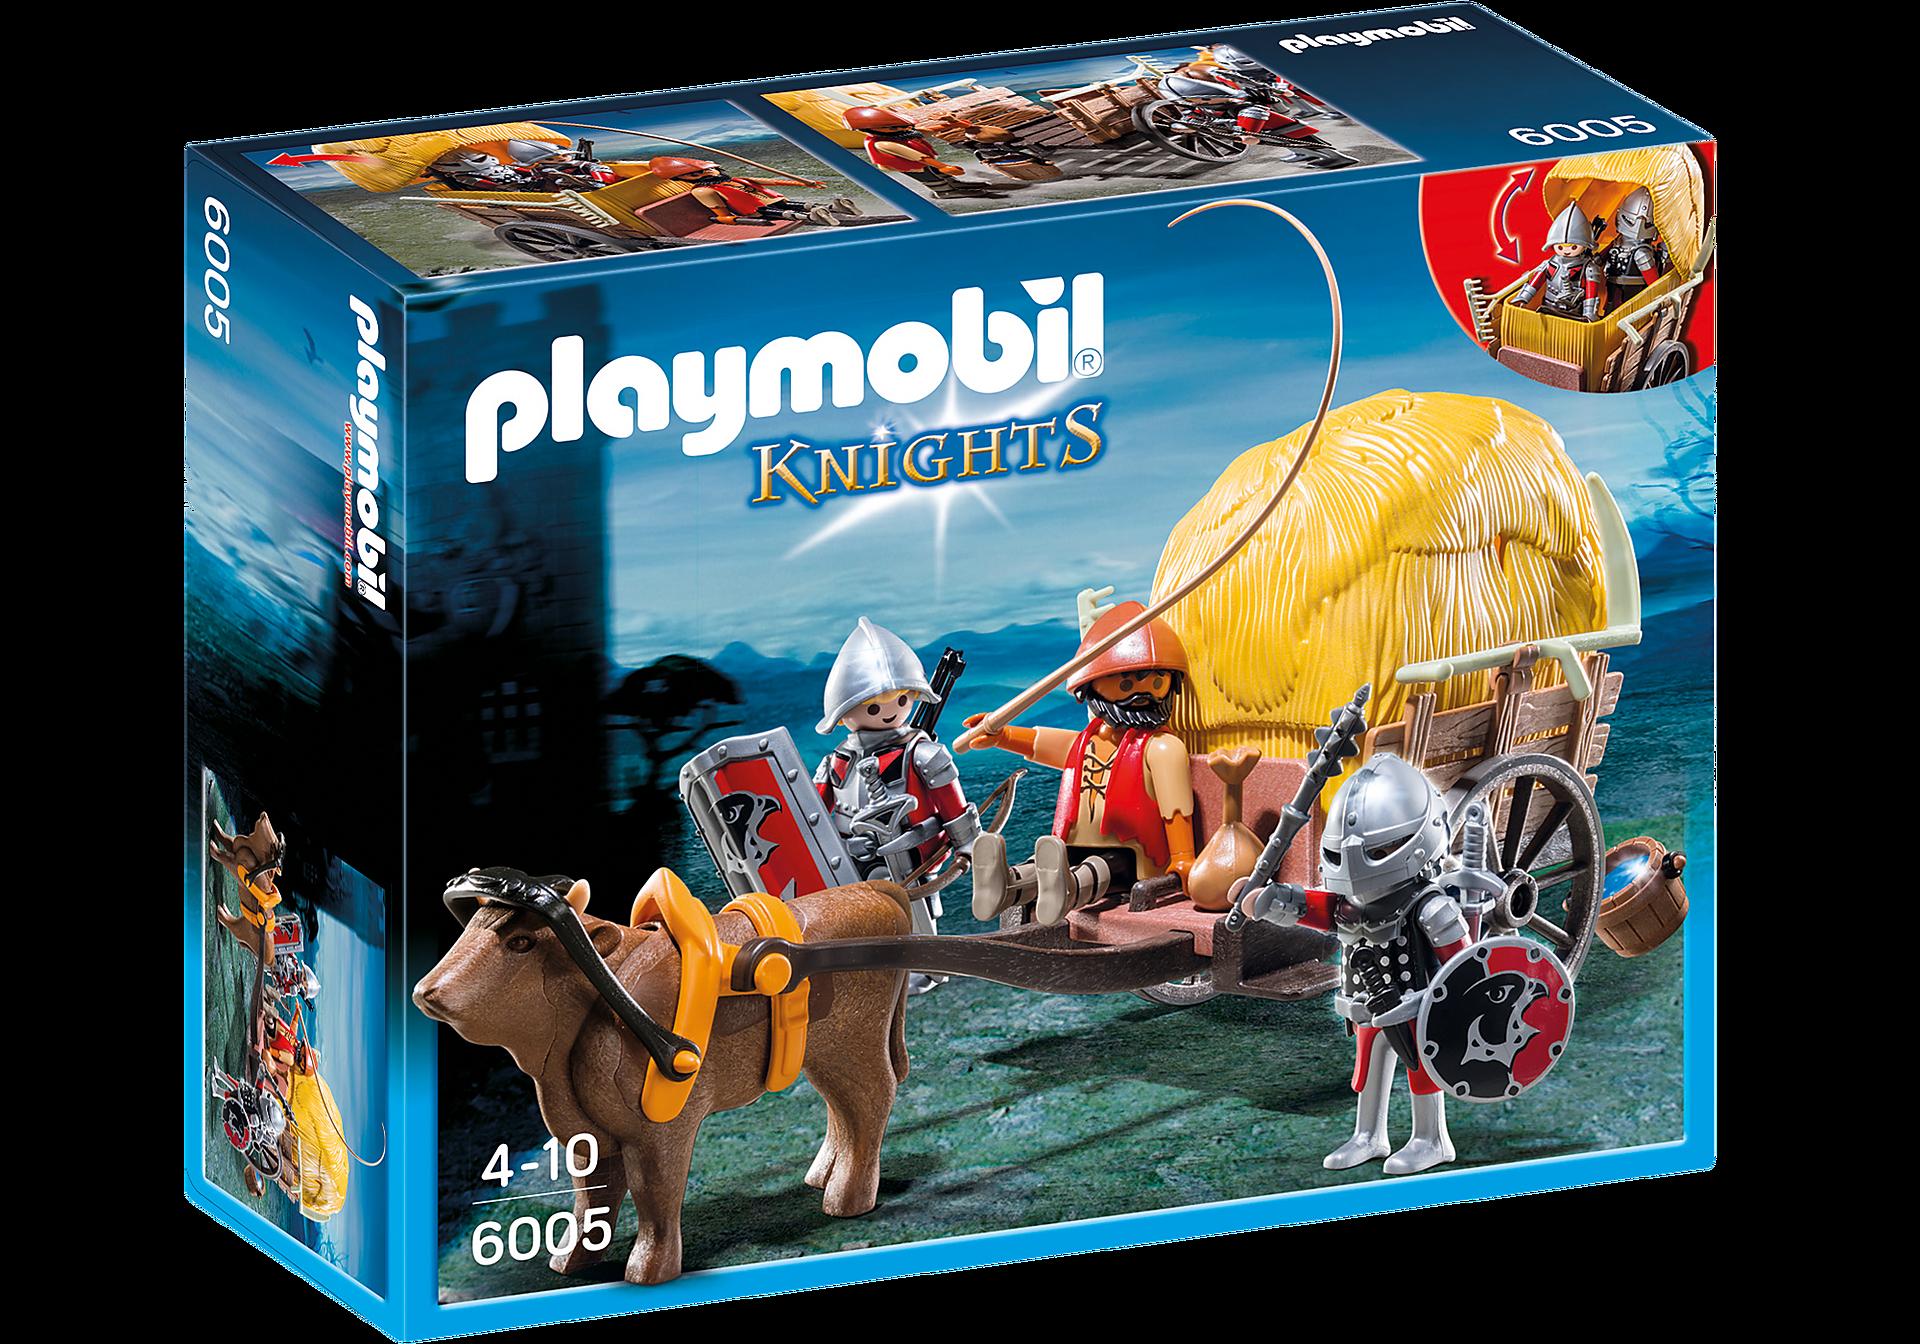 http://media.playmobil.com/i/playmobil/6005_product_box_front/Рыцари: Рыцари Сокола с камуфляжной повозкой